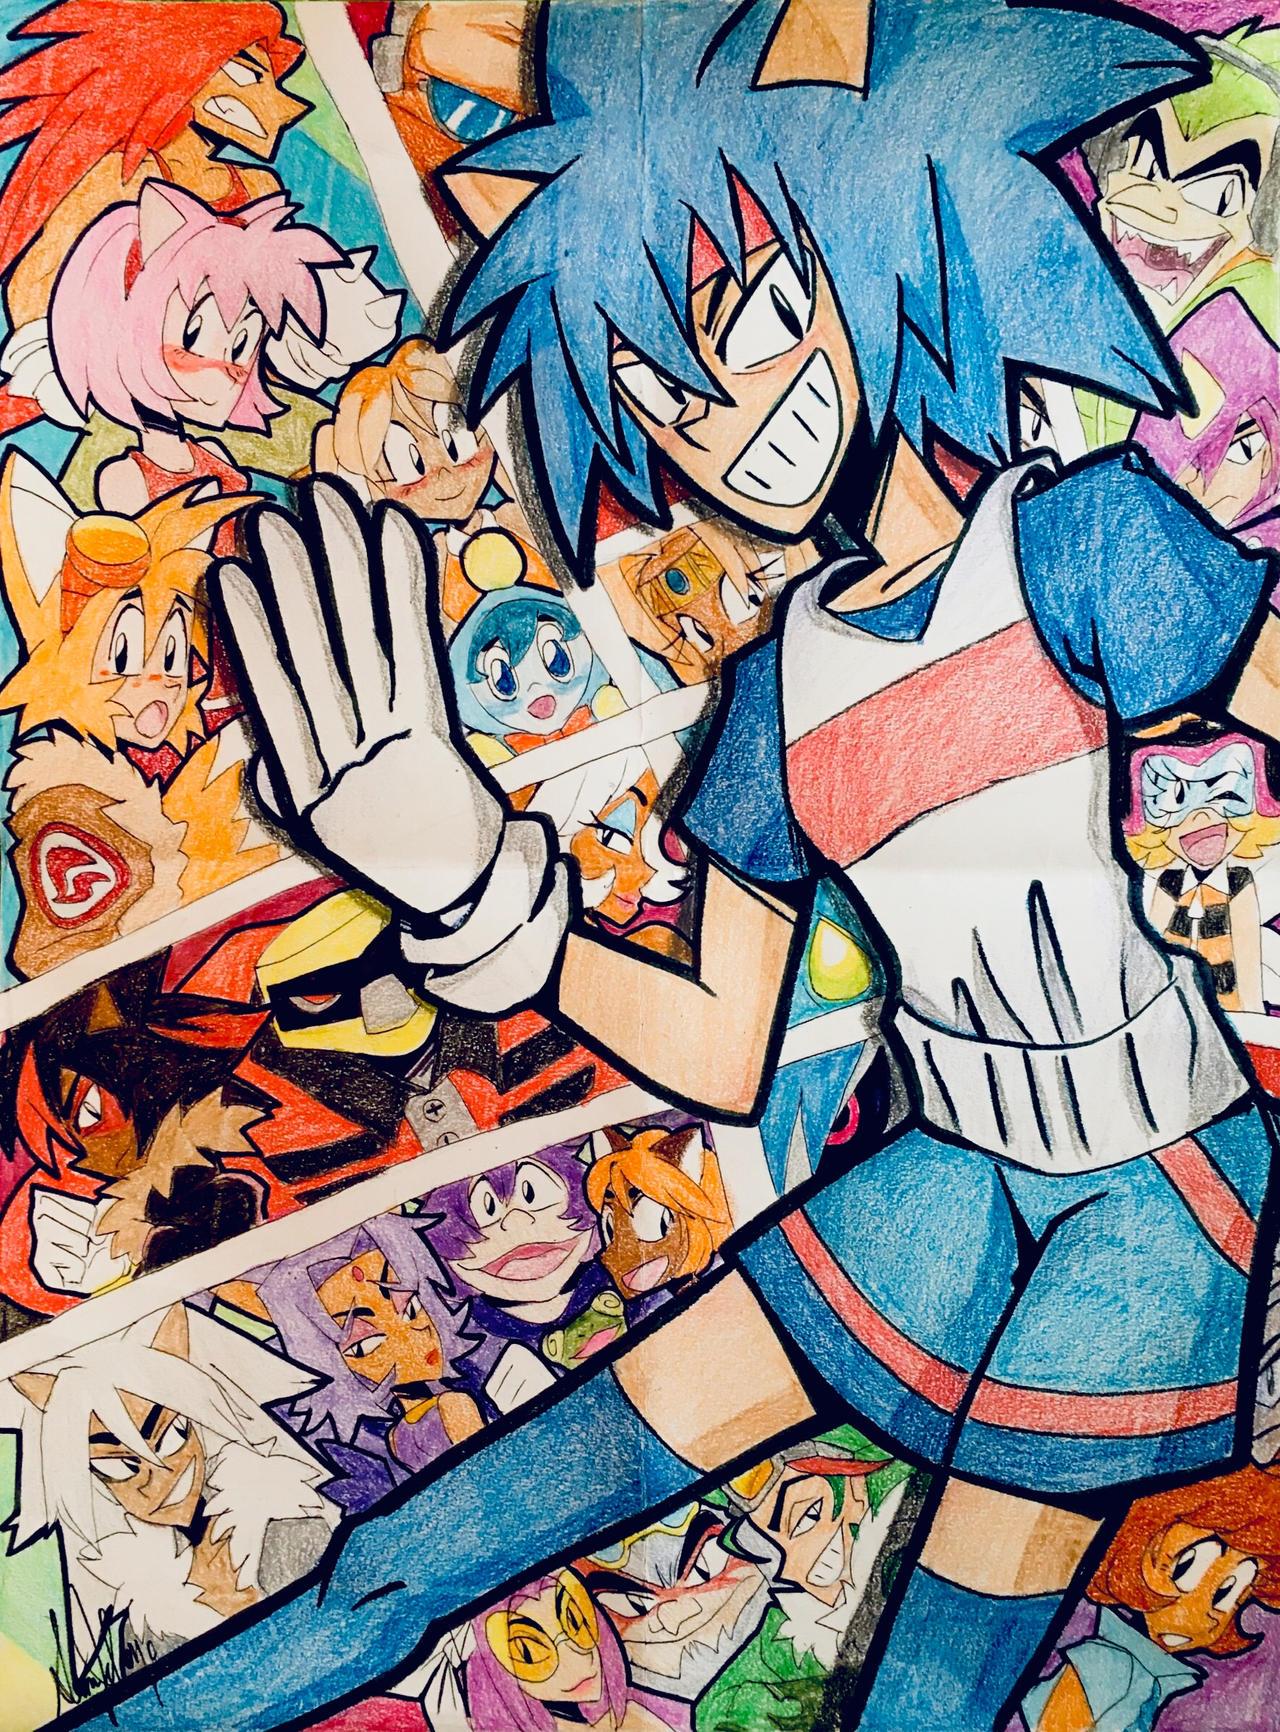 Sonic The Hedgehog Comic Art By Artfrog75 On Deviantart